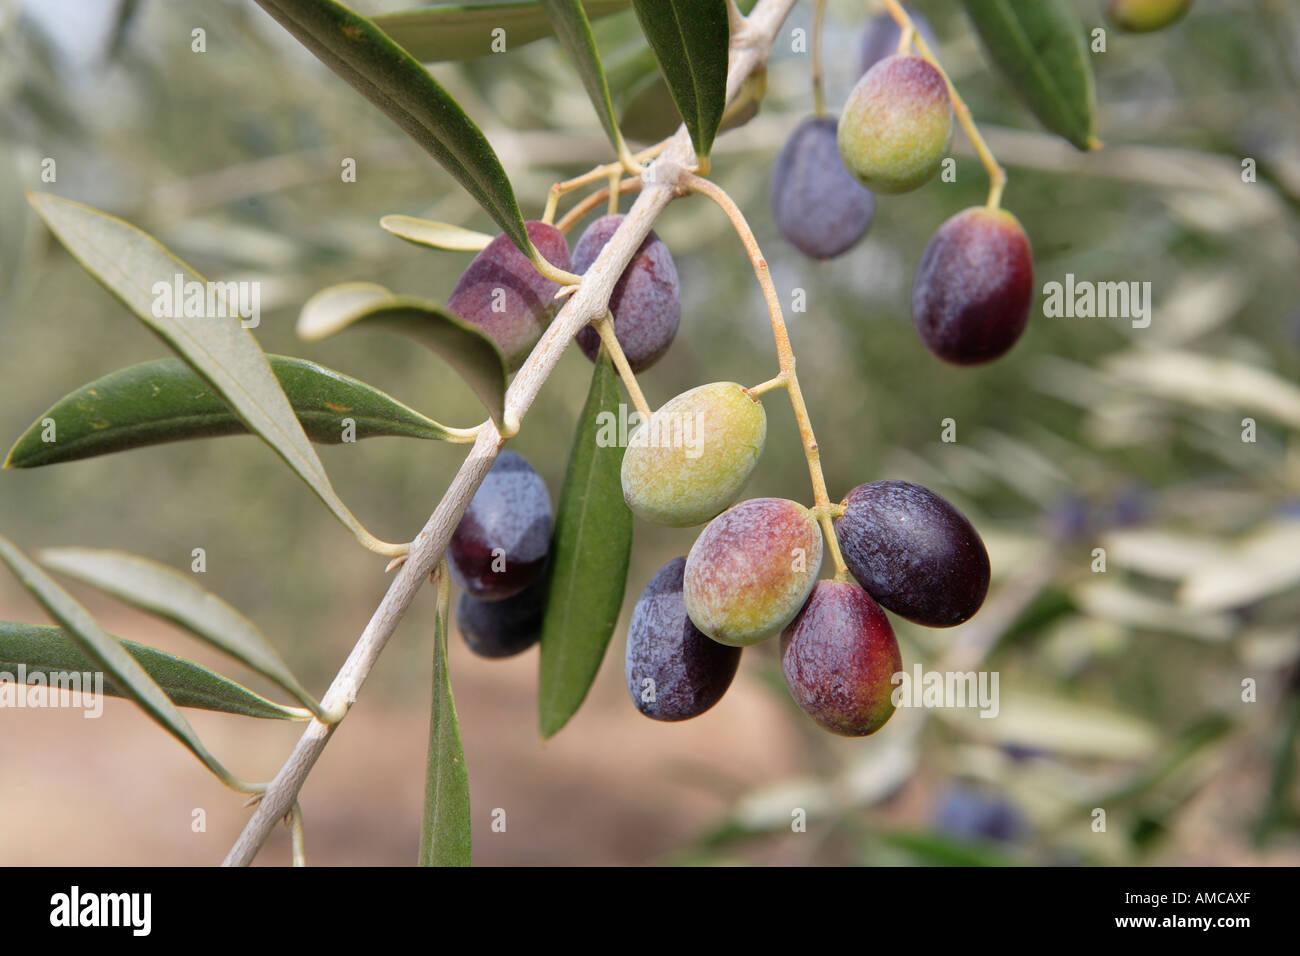 Olive tree branch symbol of peace with green and ripe black olives olive tree branch symbol of peace with green and ripe black olives north eastern victoria australia buycottarizona Choice Image